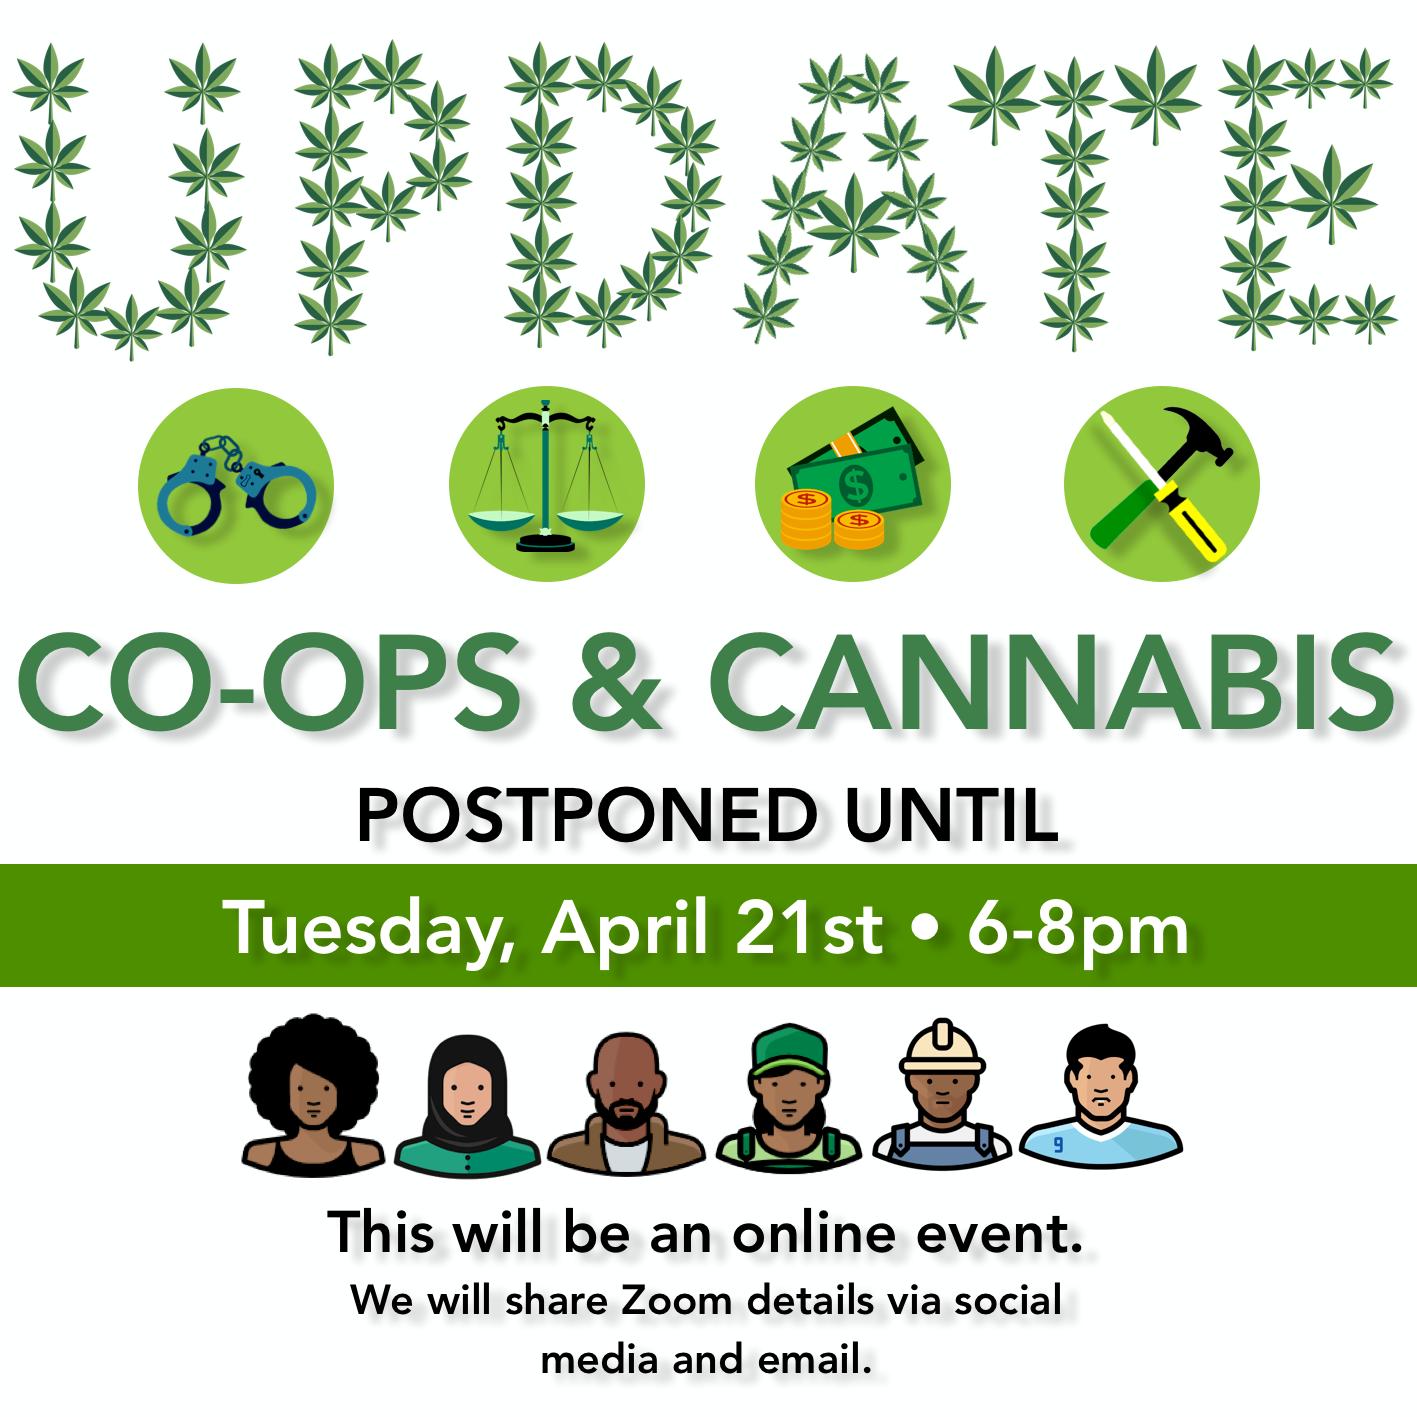 co-ops___cannabis_postponement_UPDATE.png